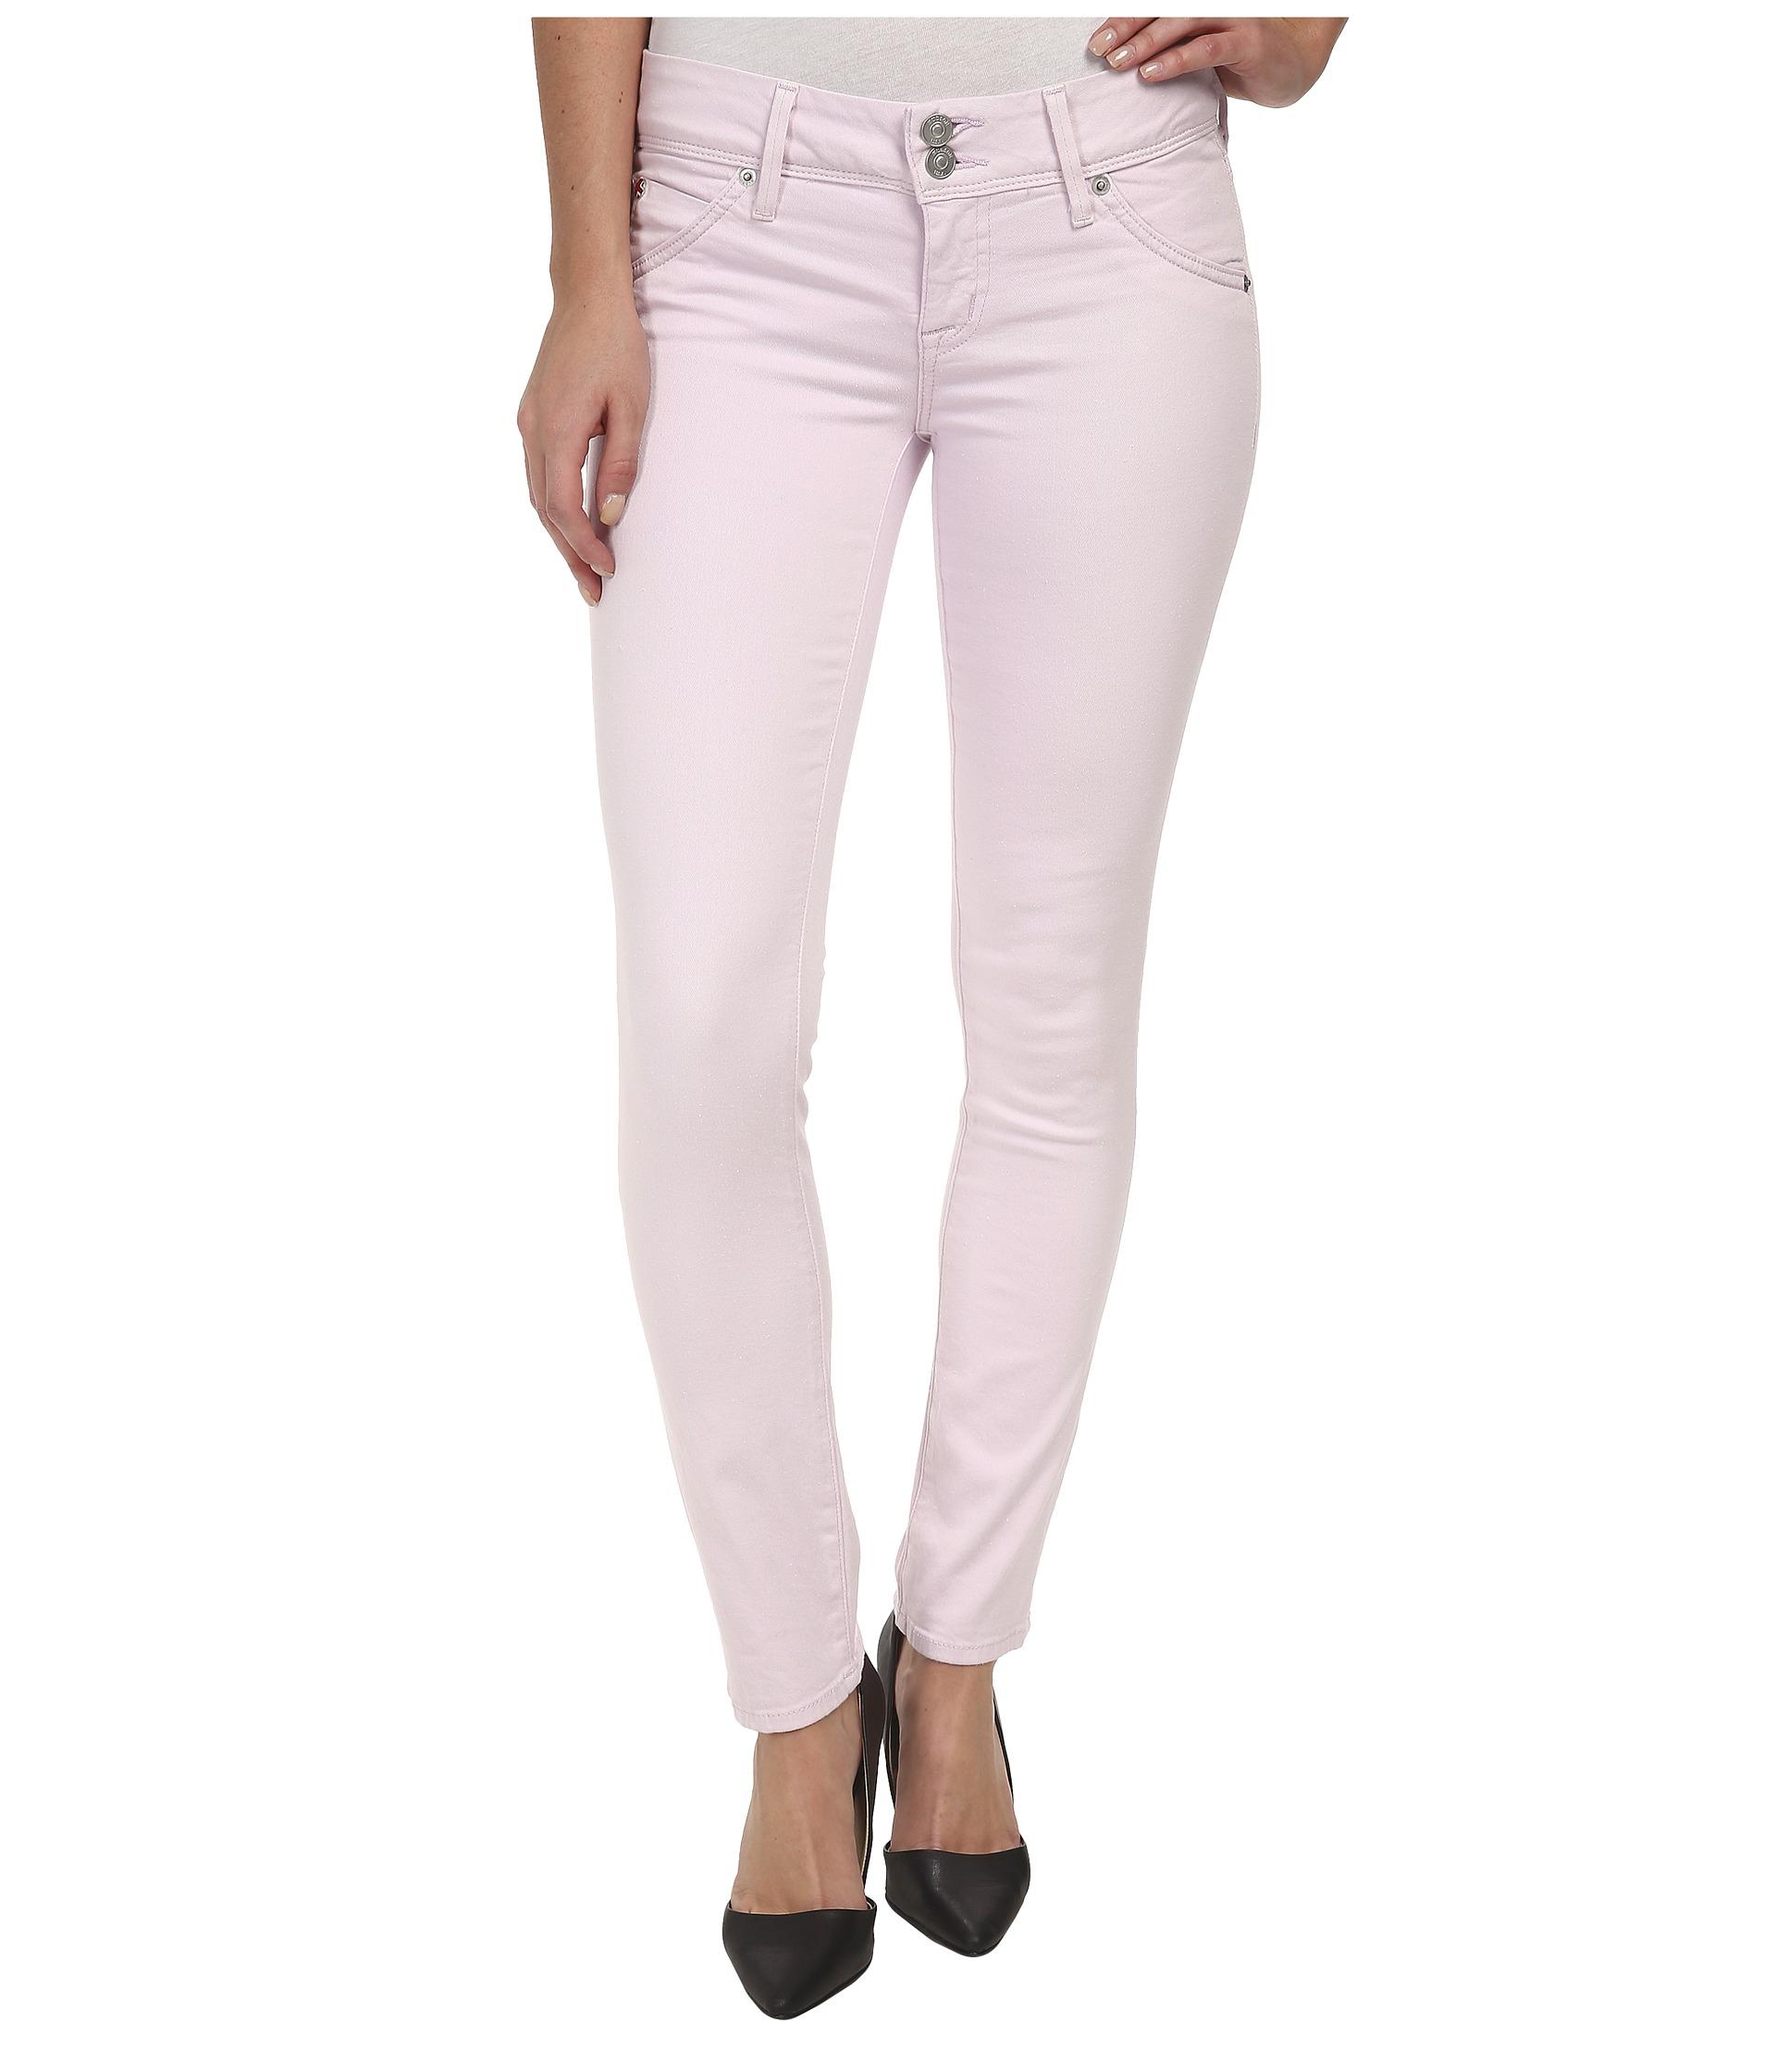 Lyst Hudson Jeans Nicole Ankle Skinny Jeans In Wild Flower In Pink